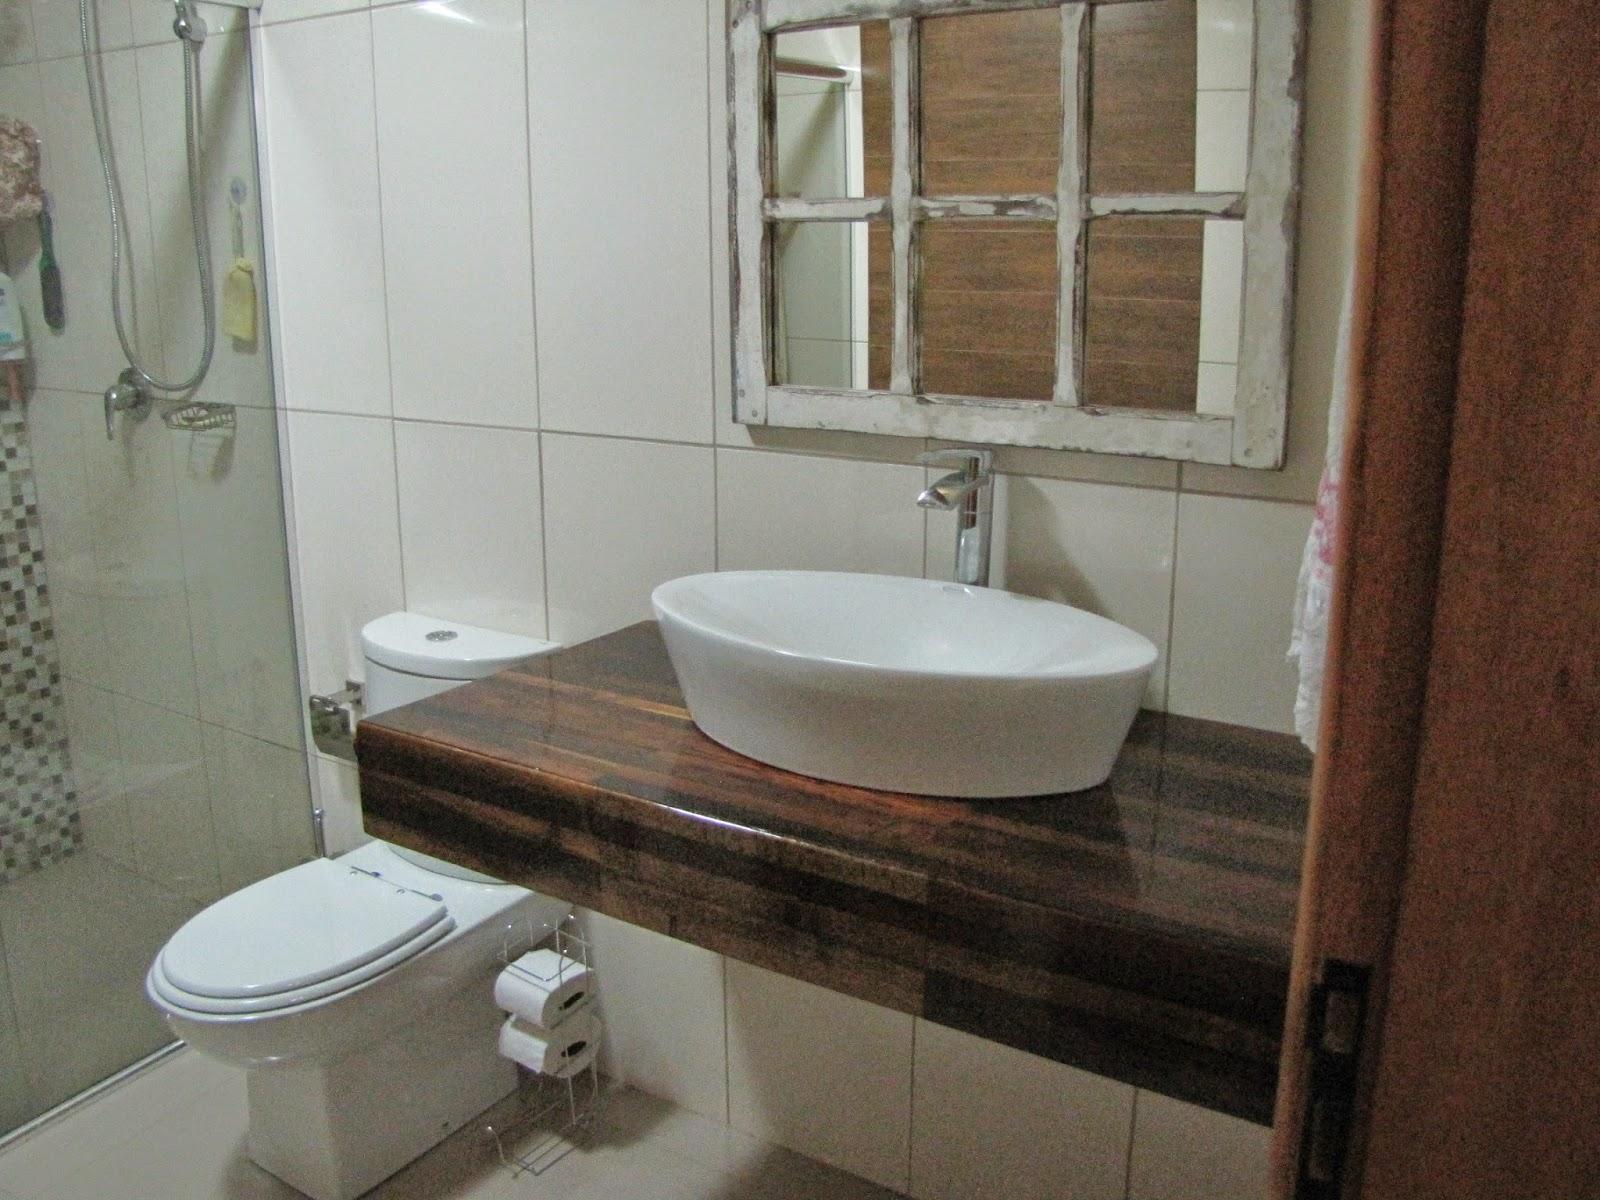 pias de vidro para banheiro 1 Book Covers #3A2A1E 1600x1200 Bancada Banheiro De Vidro